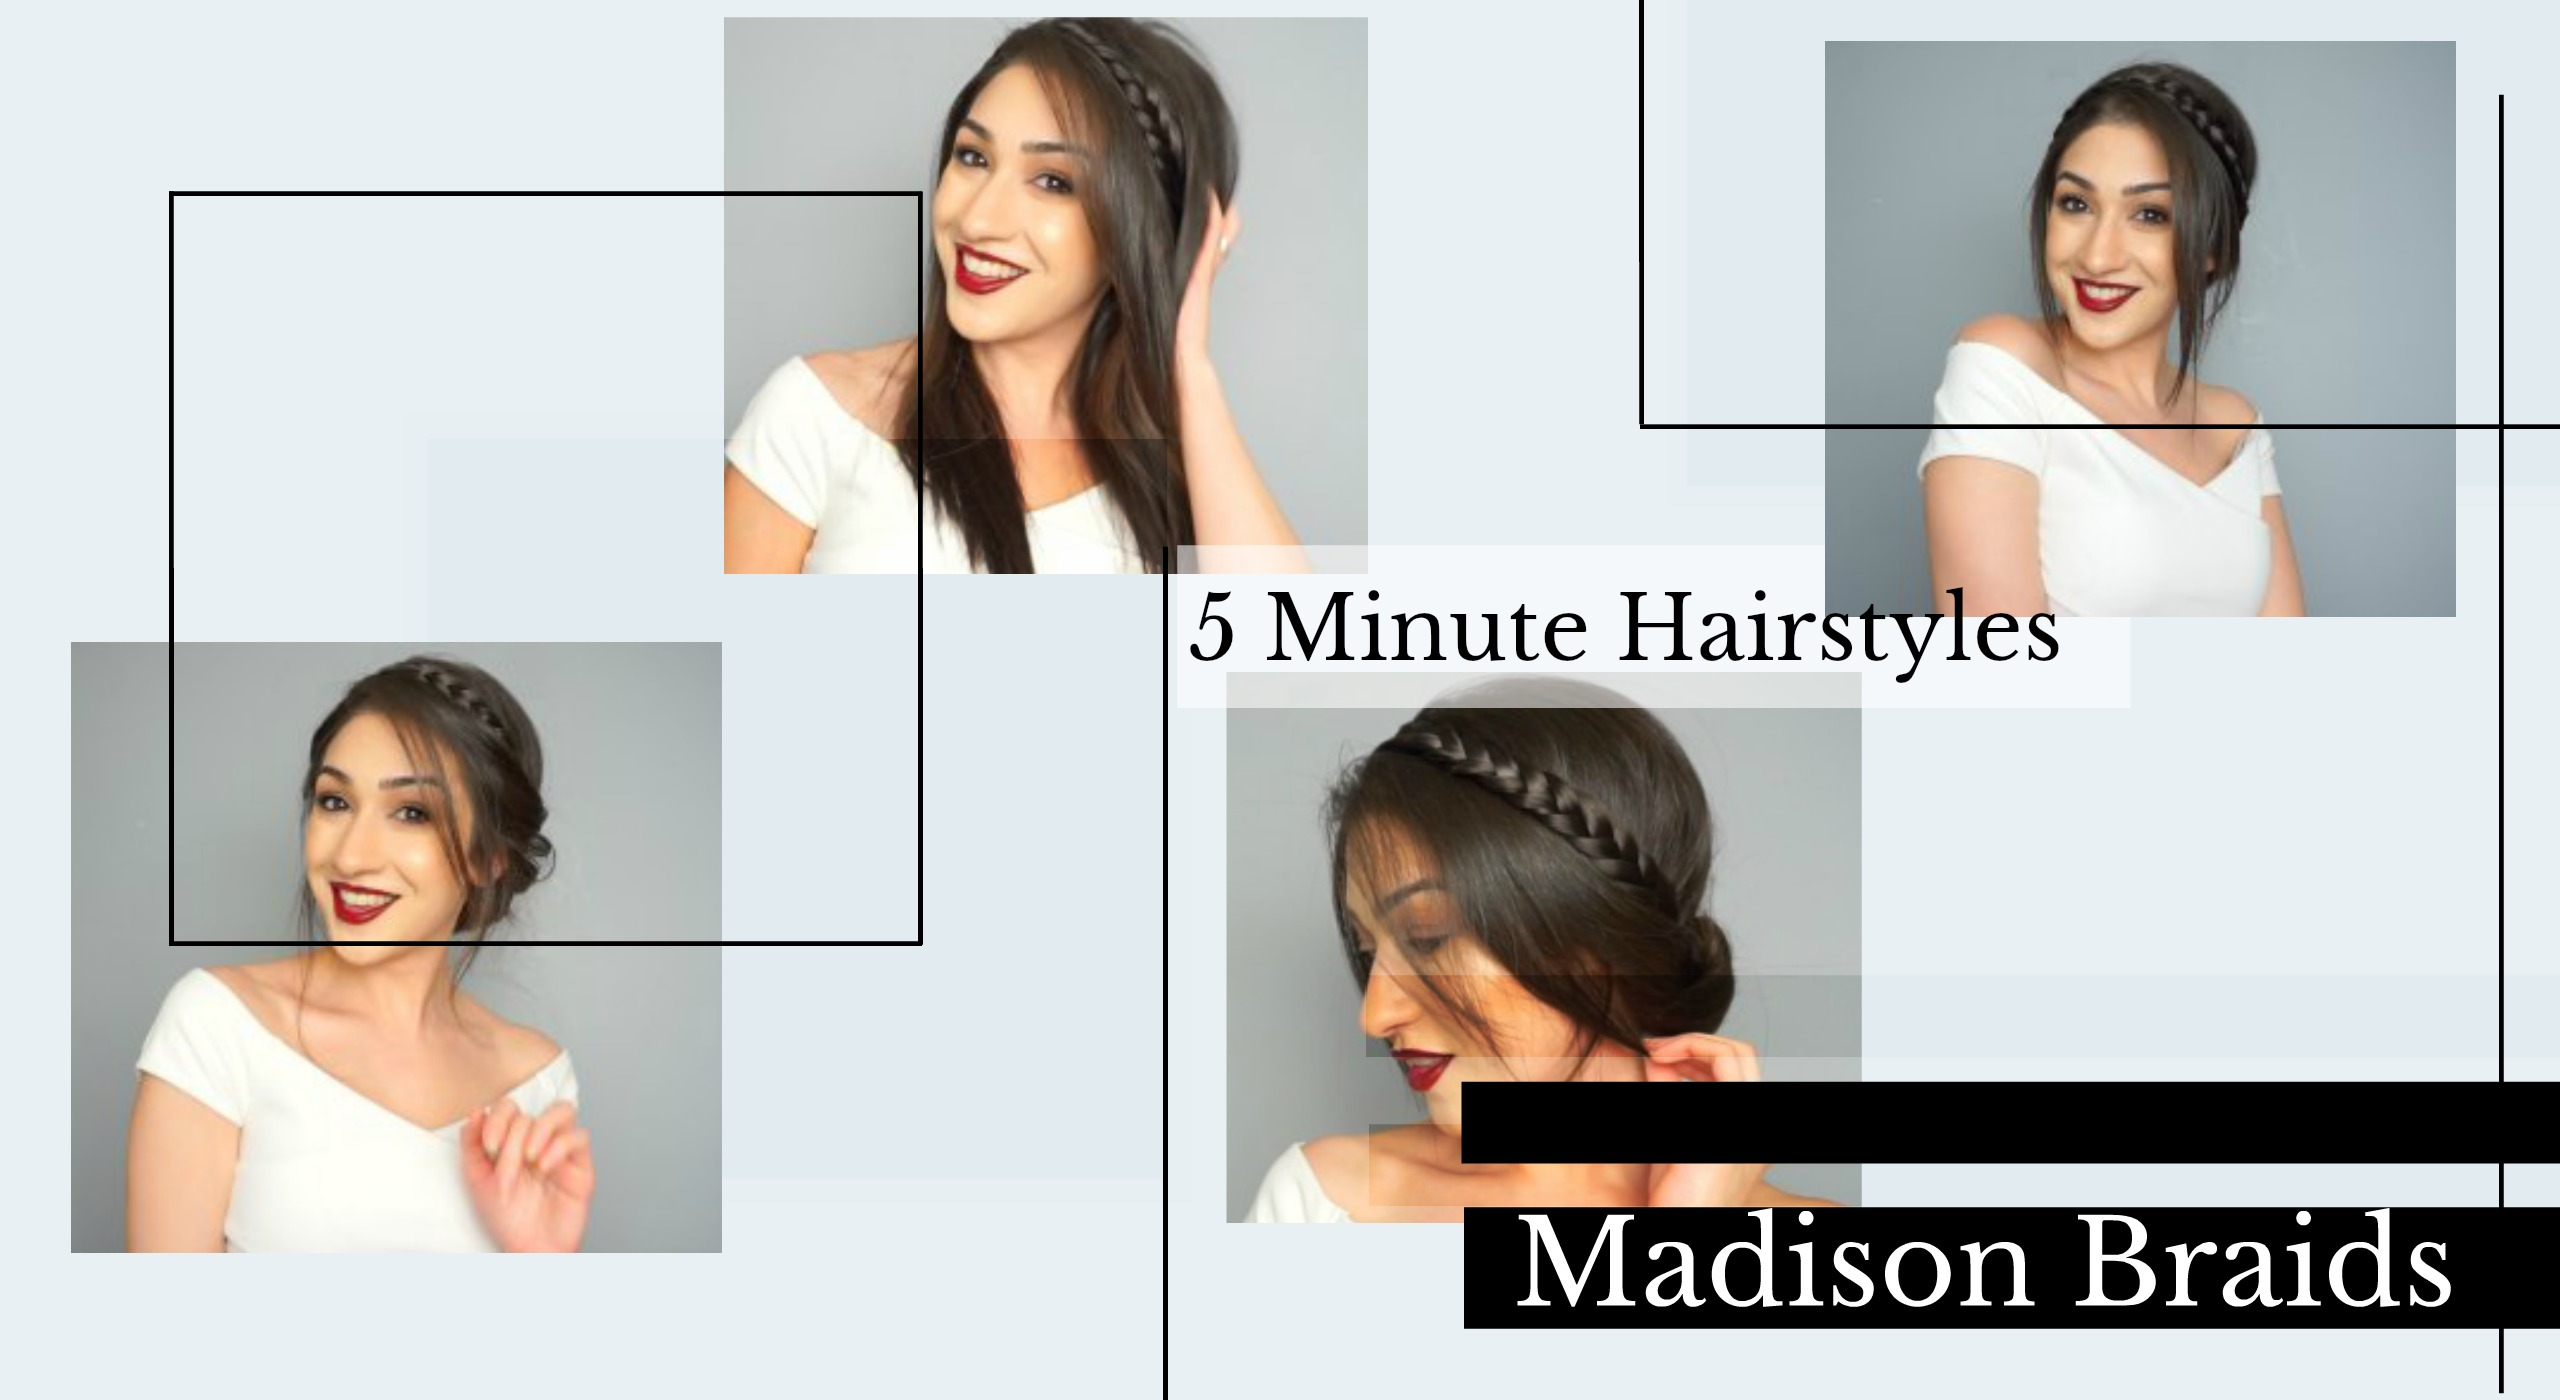 Easy Heatless Hairstyles Feat Madison Braids Looks Fashion Potluck